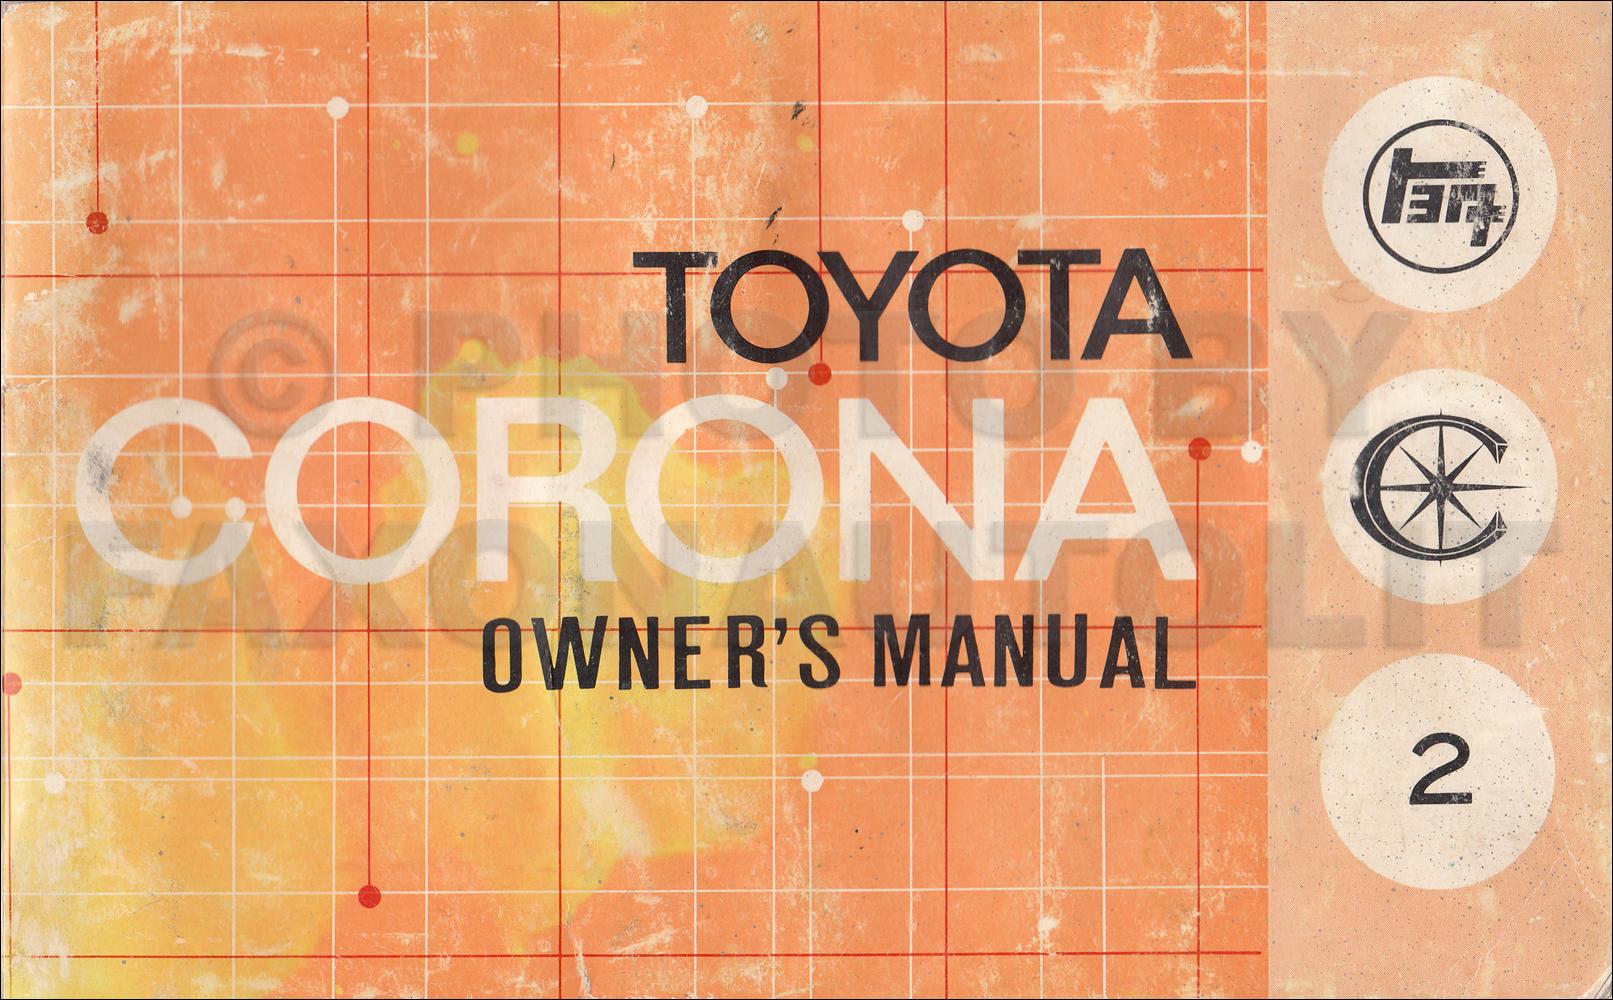 1971 toyota corona owner's manual original rt83 rt93